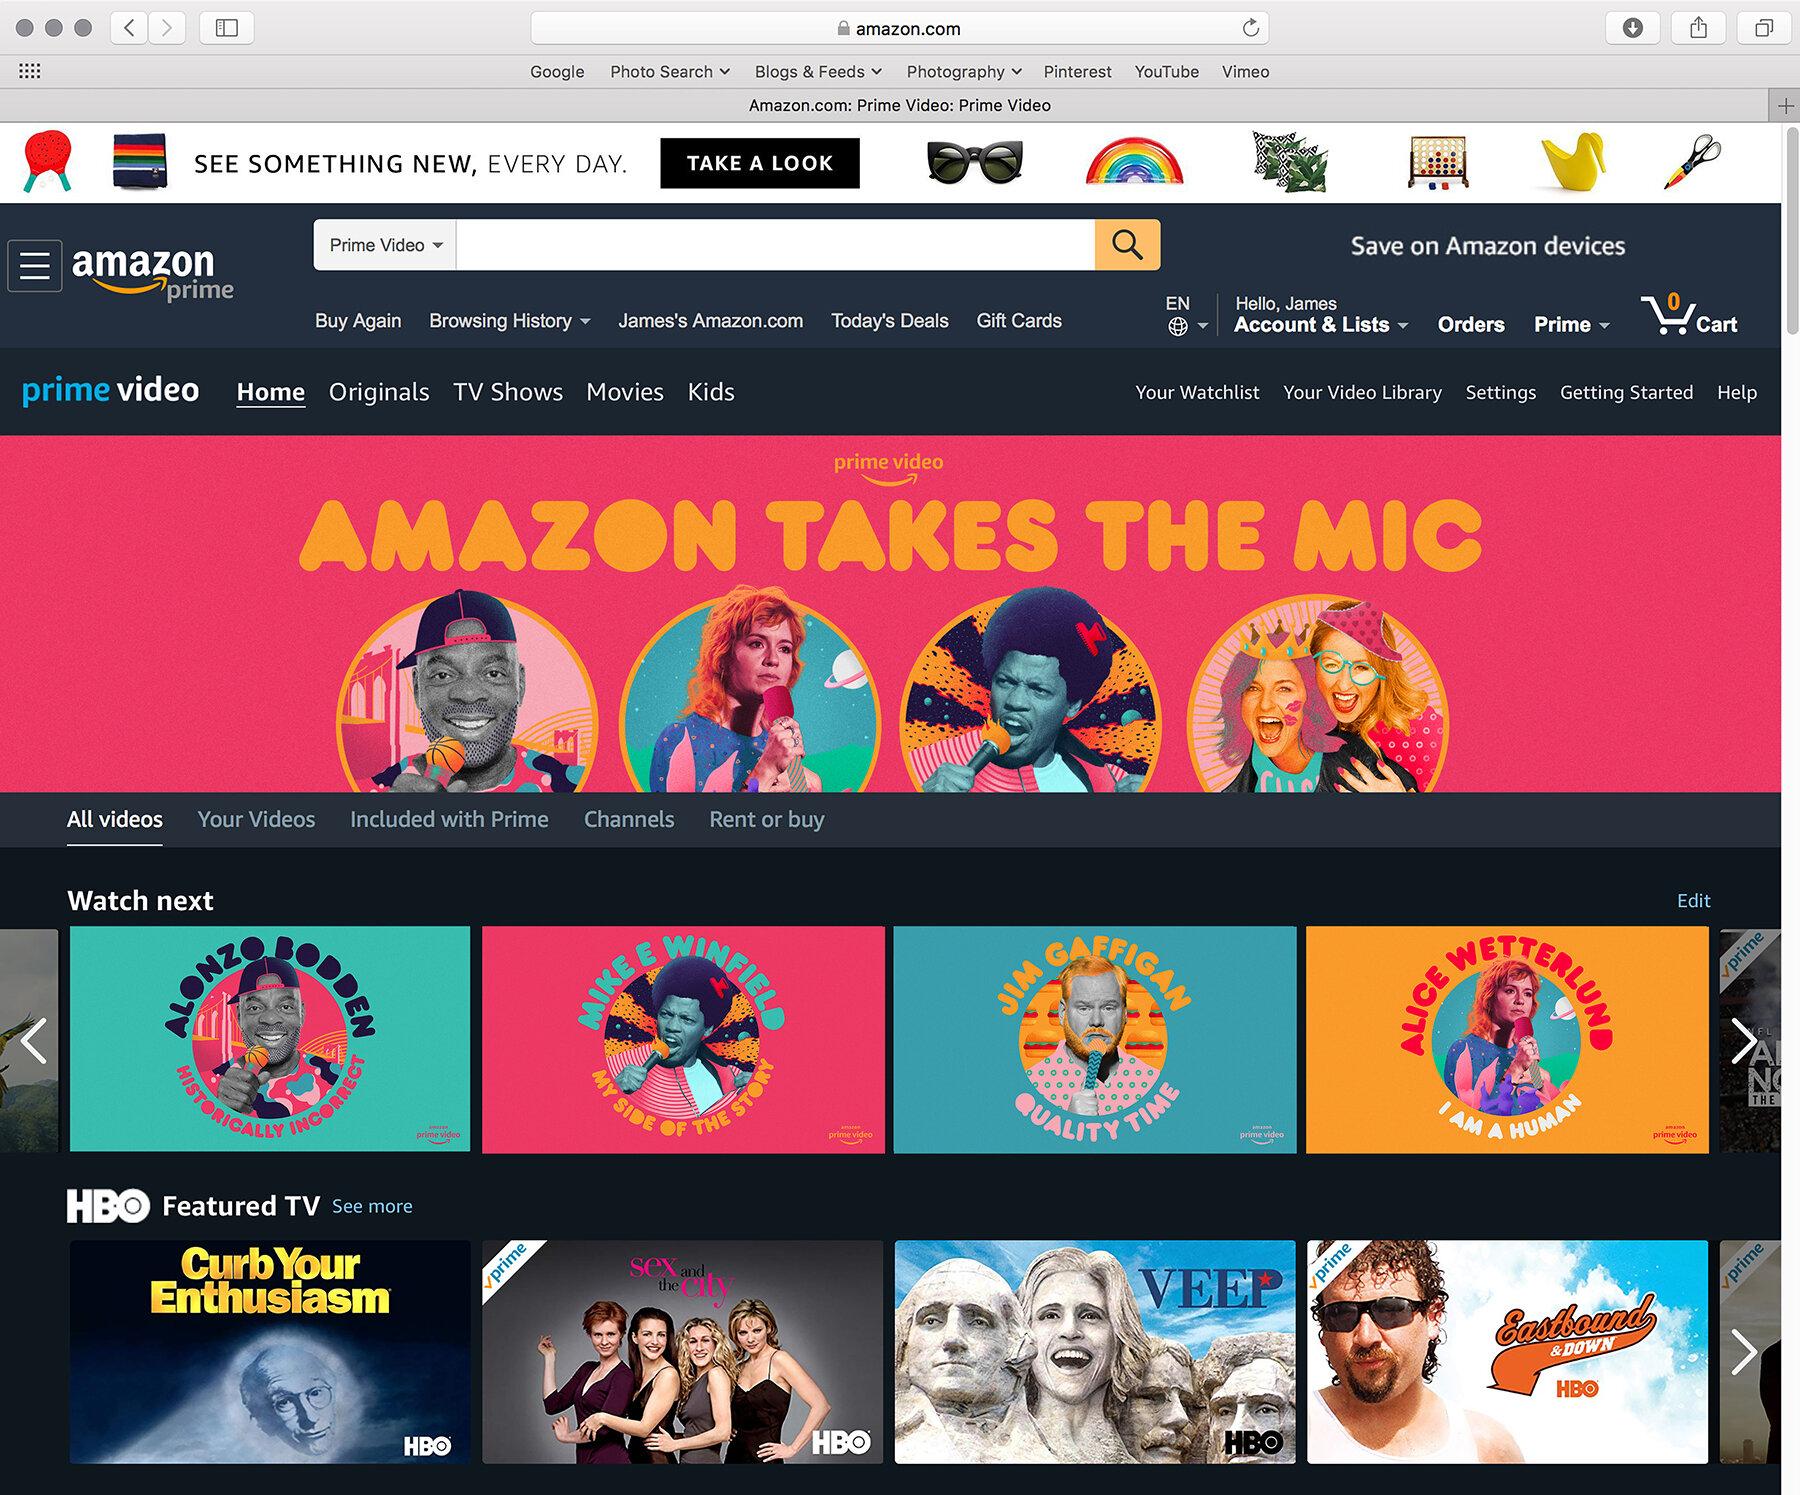 Amazon_B_UI_4000x800.jpg